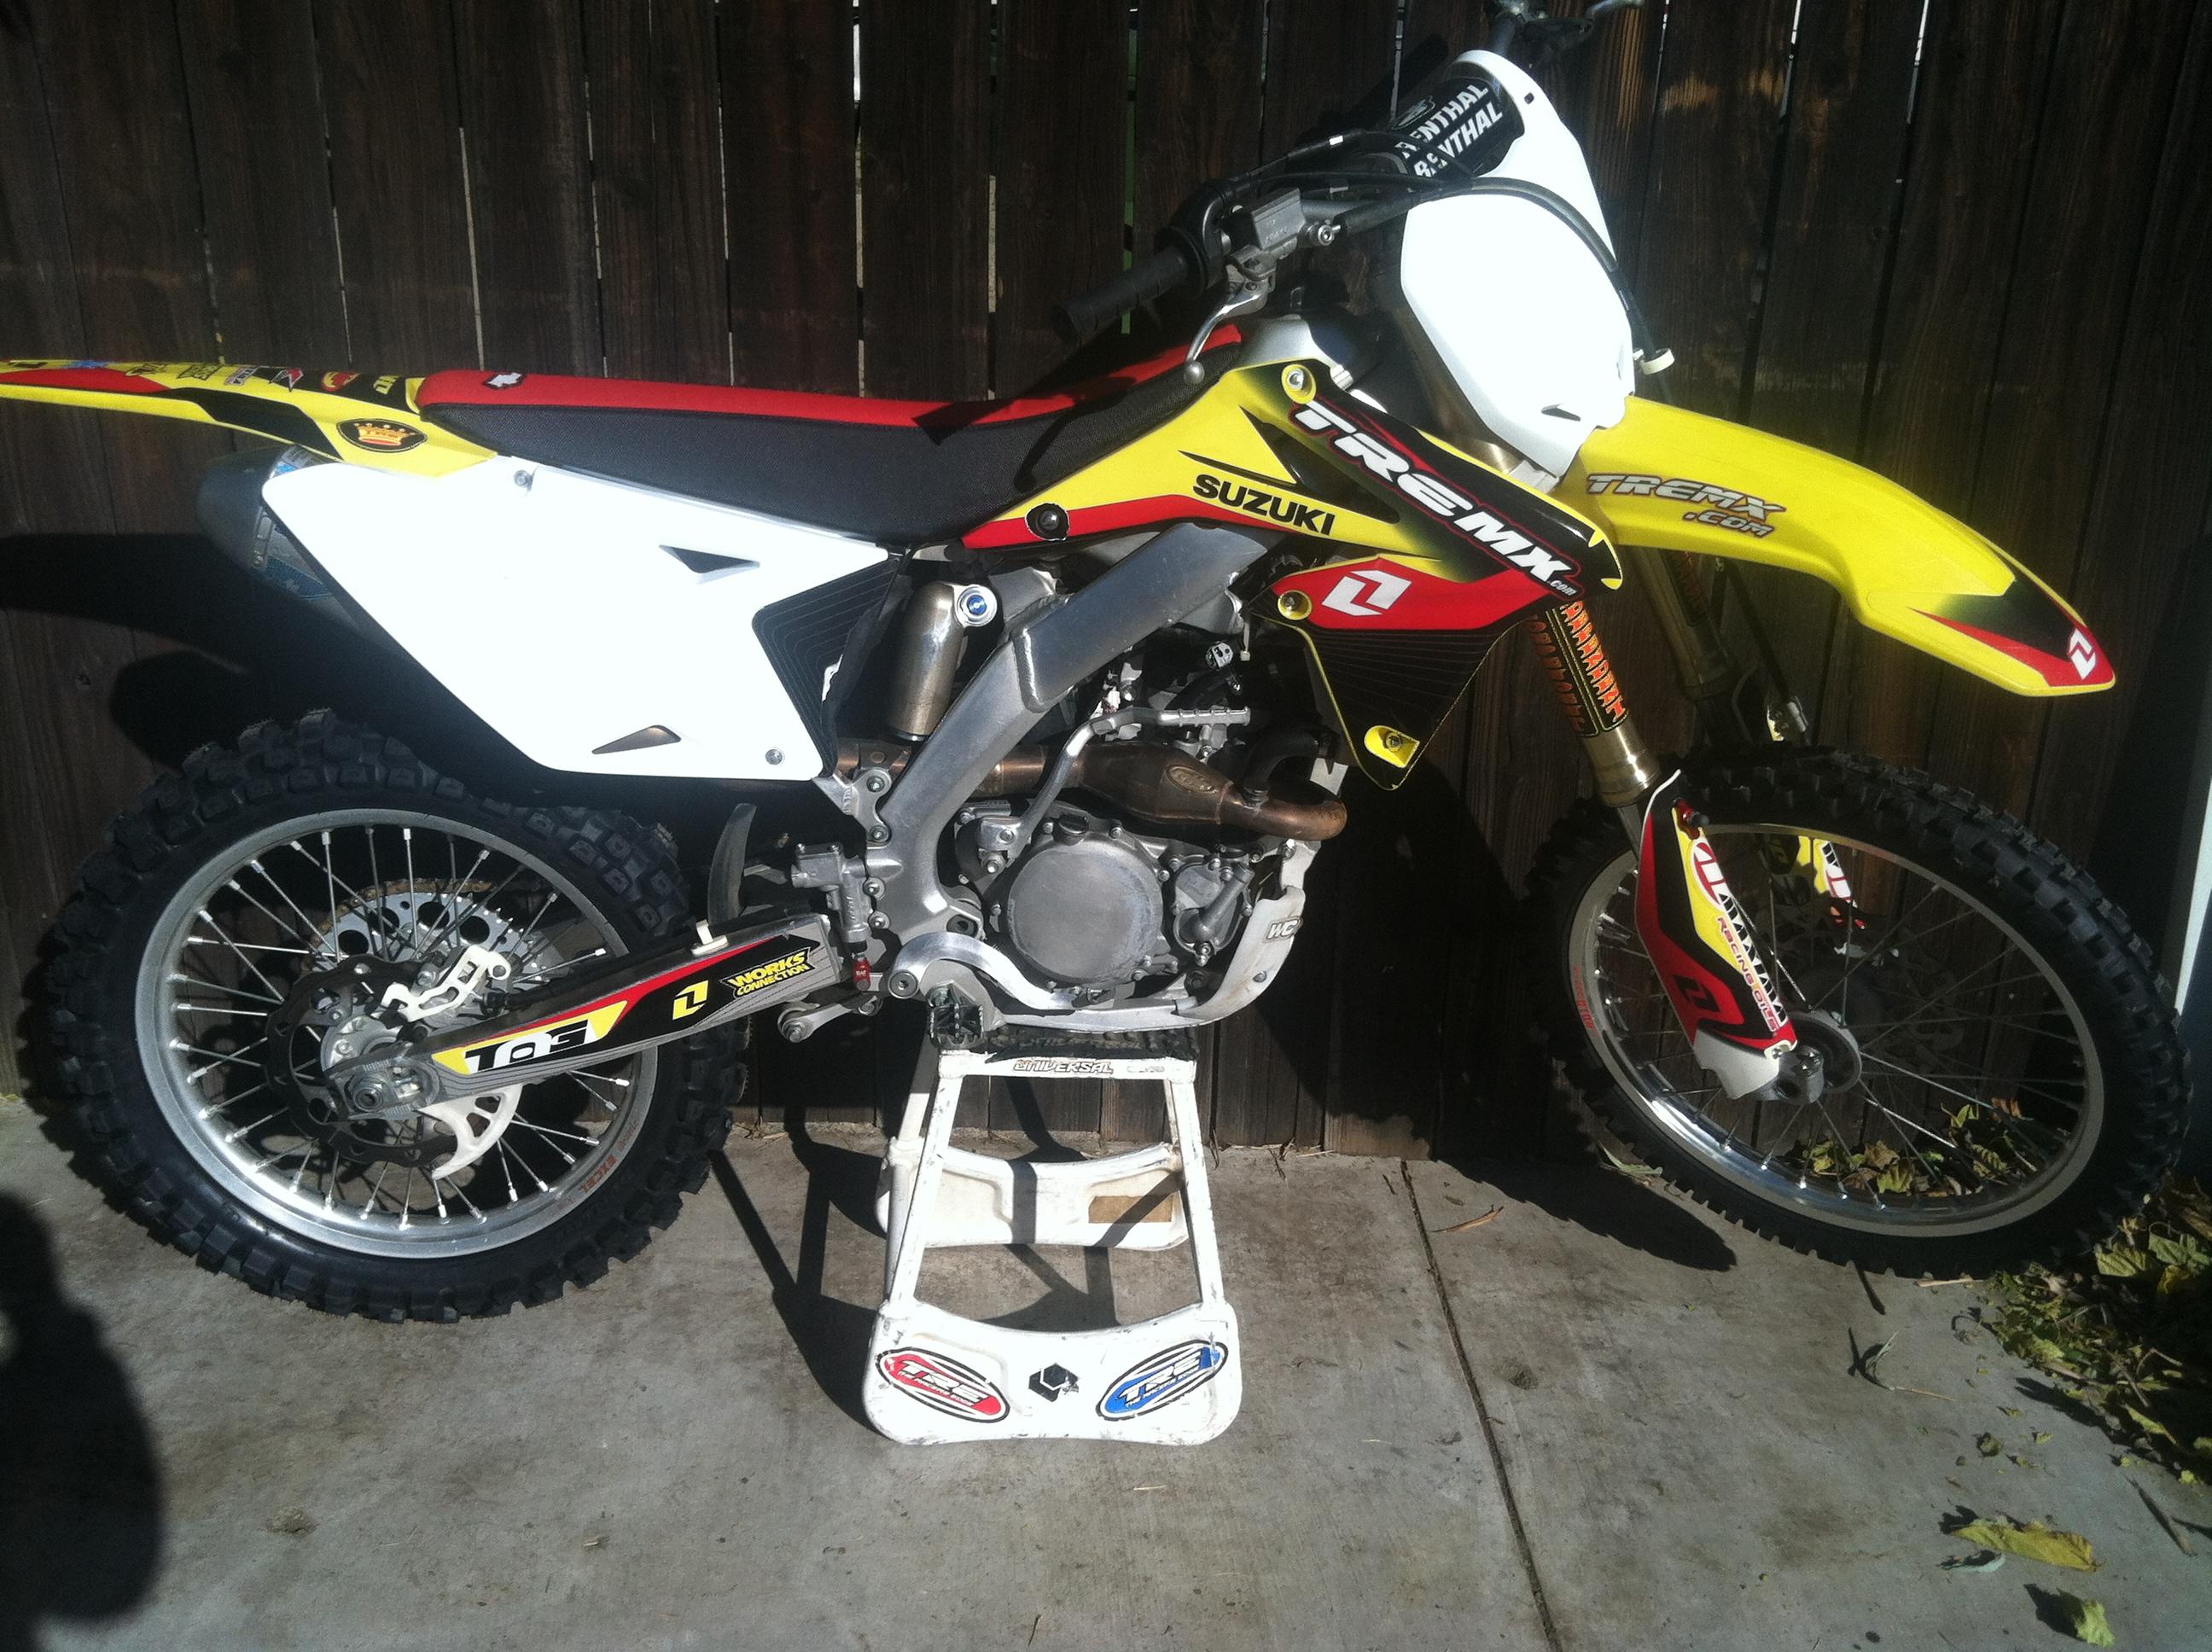 For Sale: 2011 Suzuki rmz 250 - Moto-Related - Motocross ... Race Bike Photos 2013